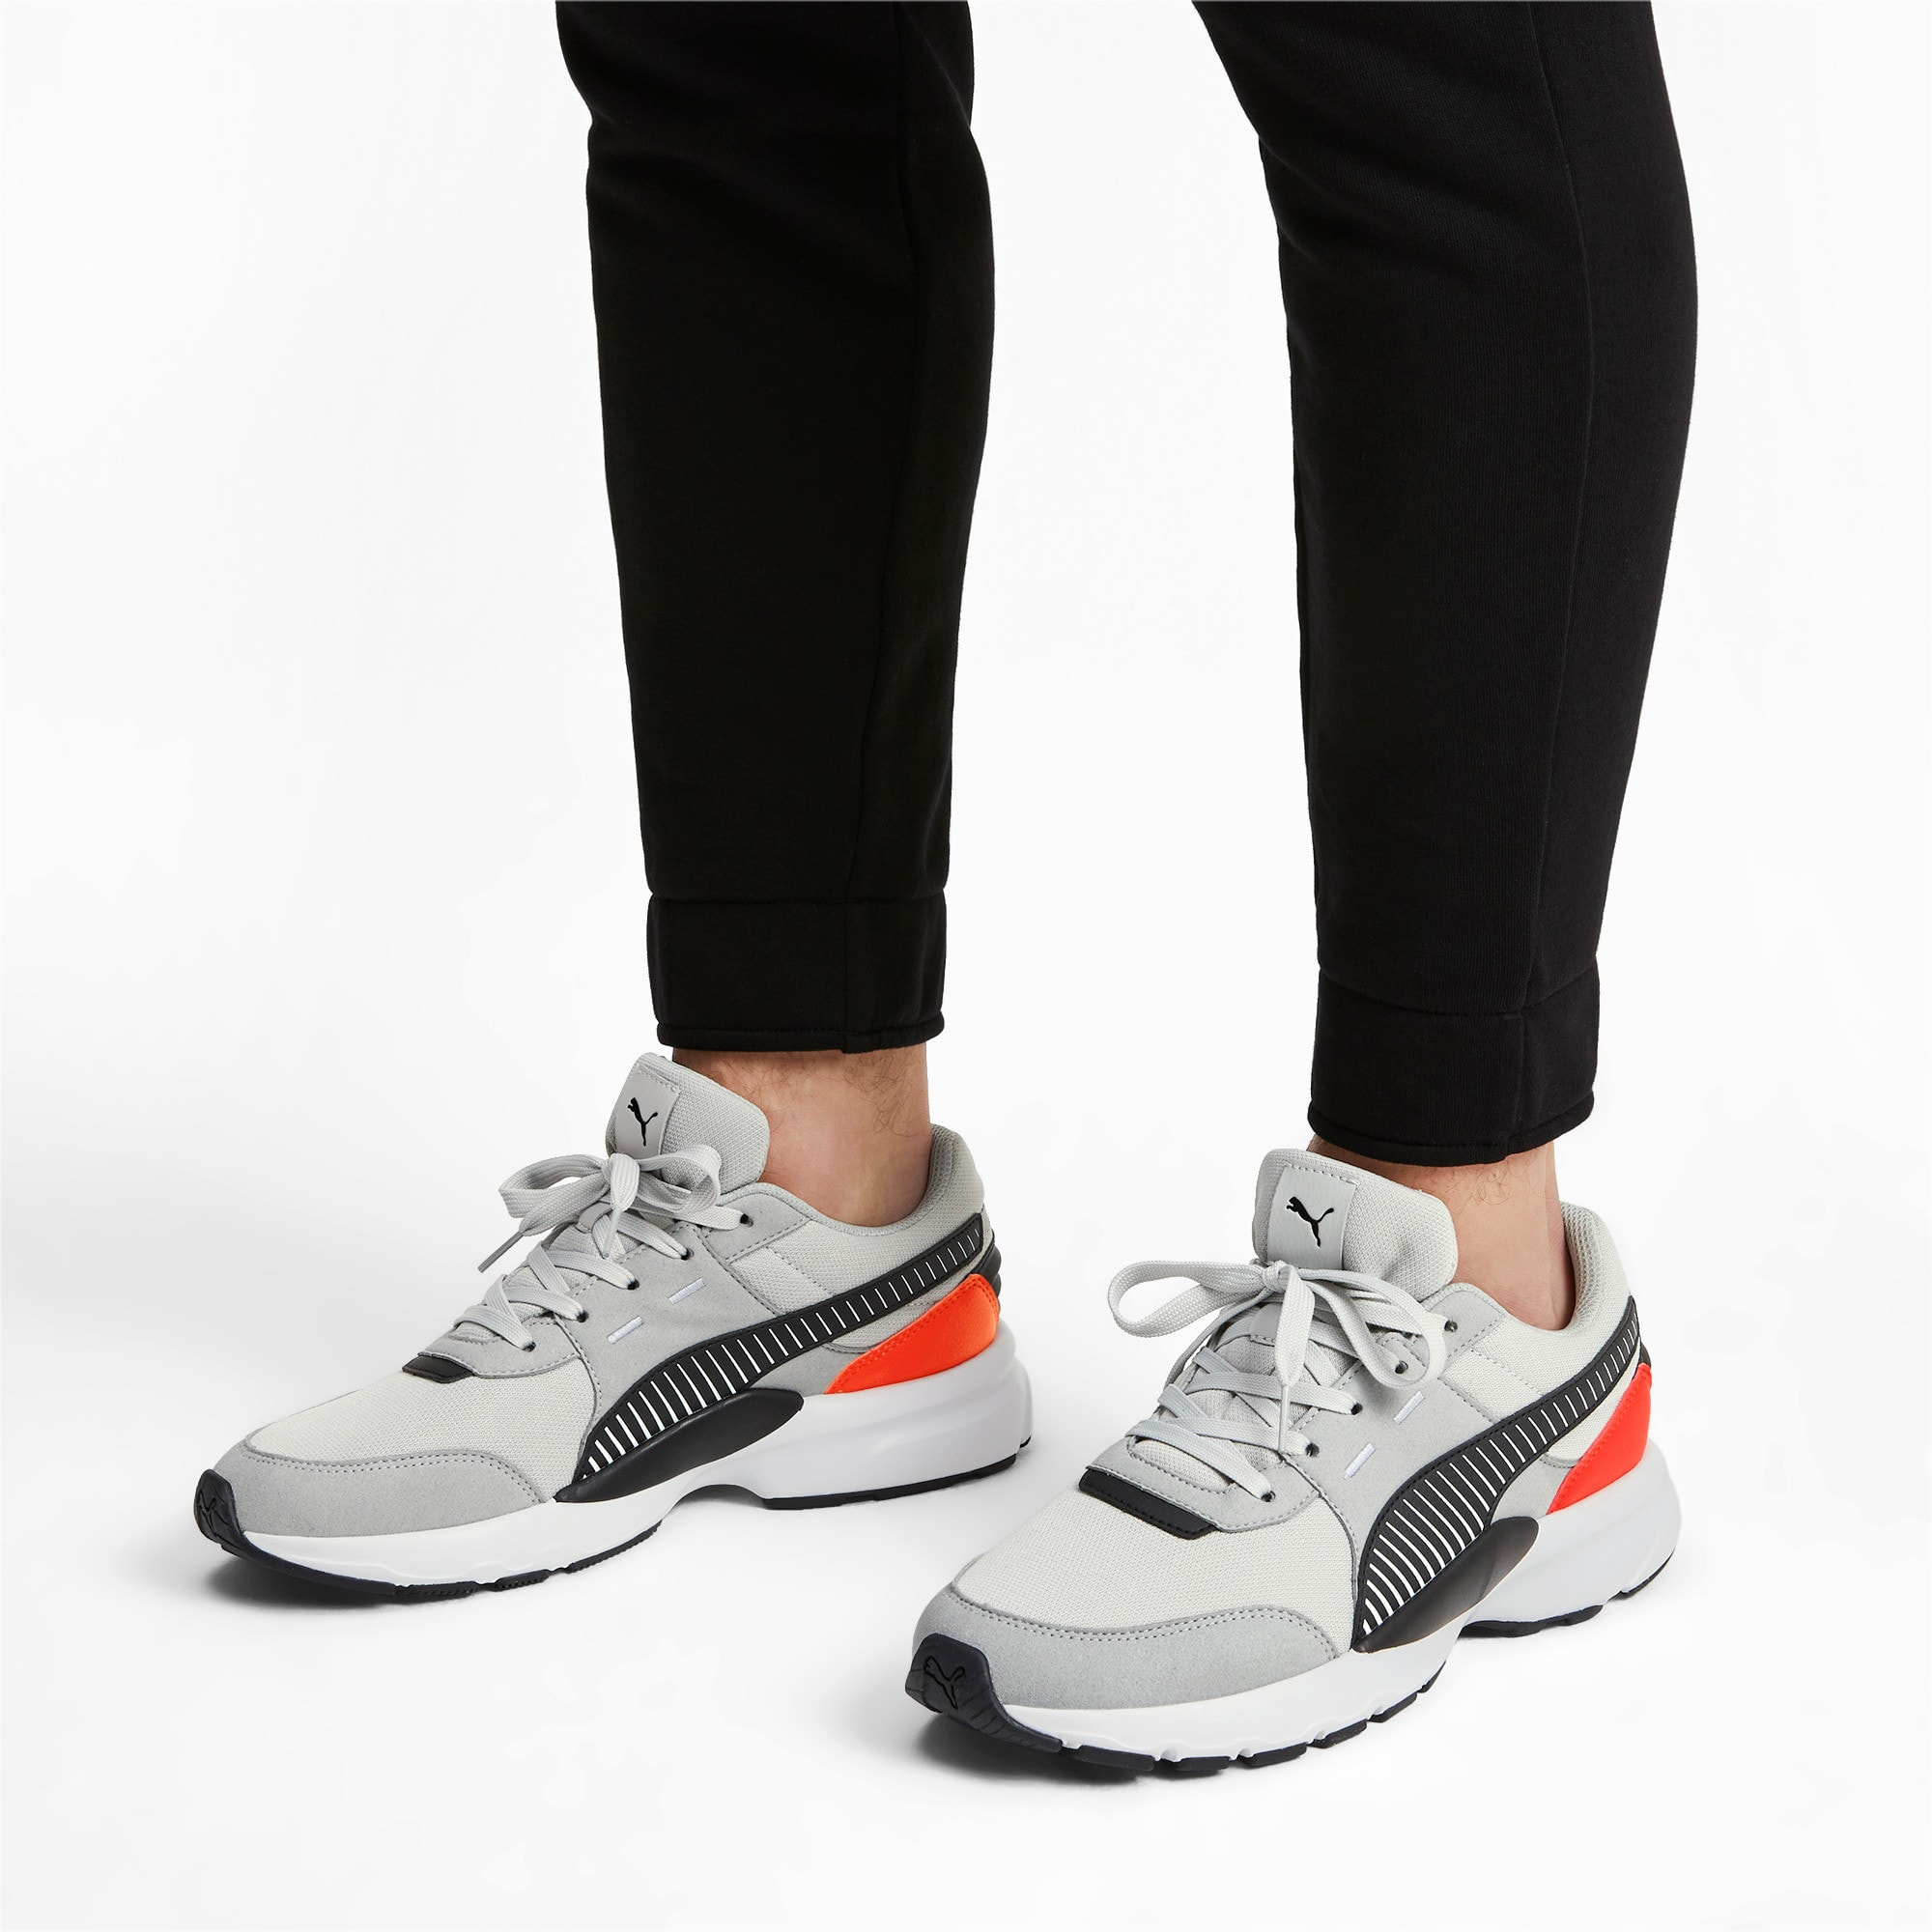 Thumbnail 2 of Future Runner Running Shoes, High Rise-Black-C Tomato-Wht, medium-IND